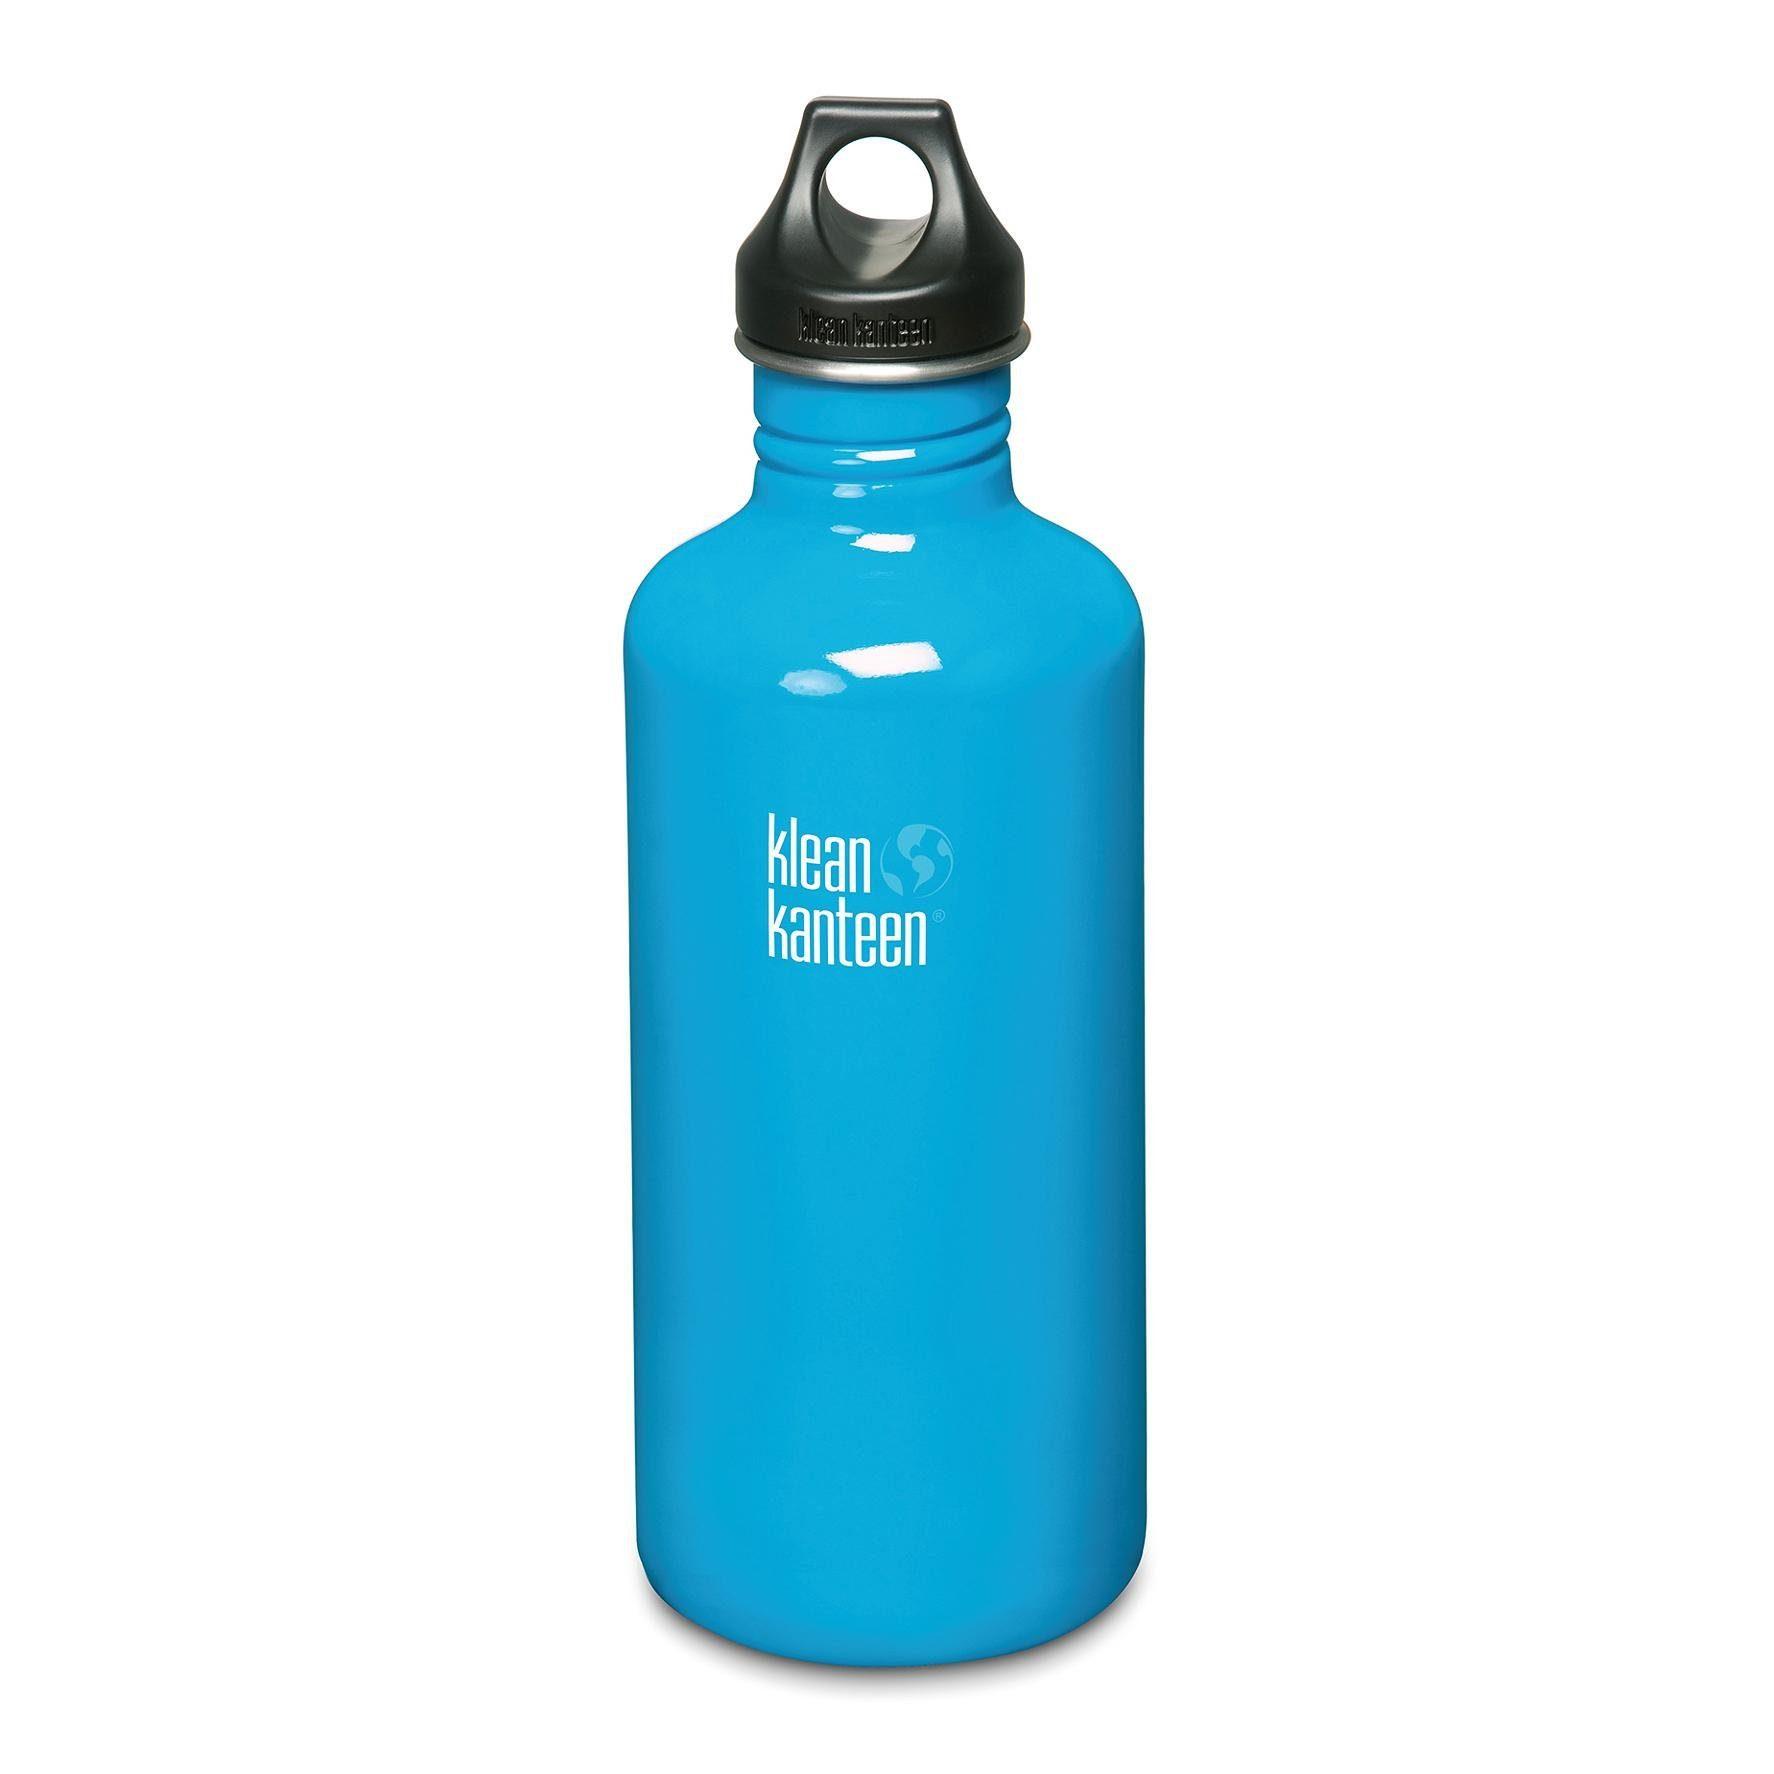 Klean Kanteen Trinkflasche »Classic Trinkflasche mit Loop Cap 1182ml«